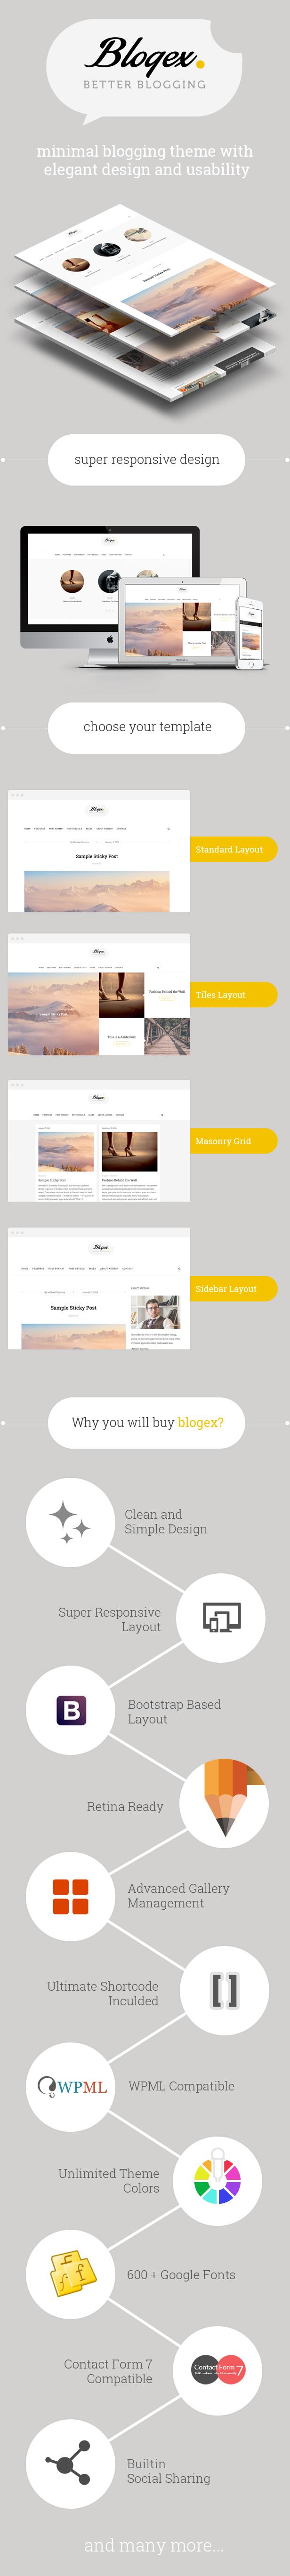 Blogex - Minimal Responsive Wordpress Blog Theme - 1